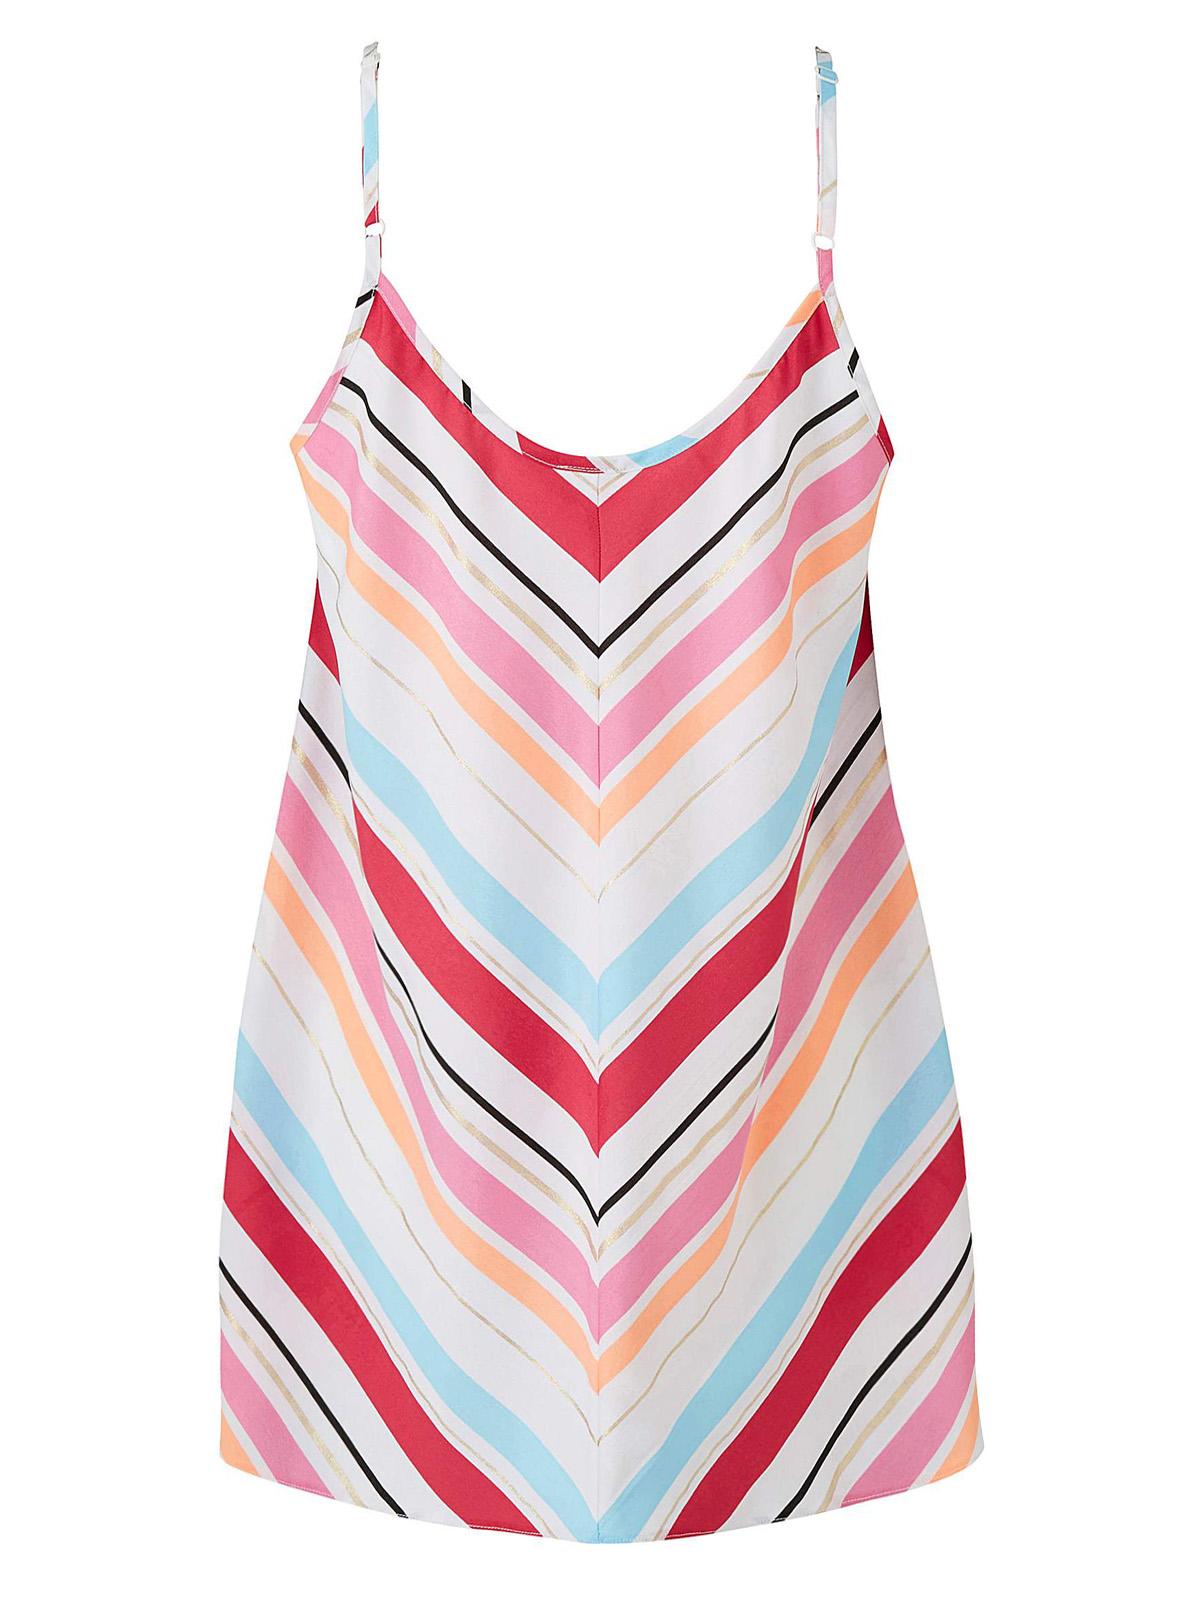 3vans pink strappy secret support cami vest in sizes 14-32